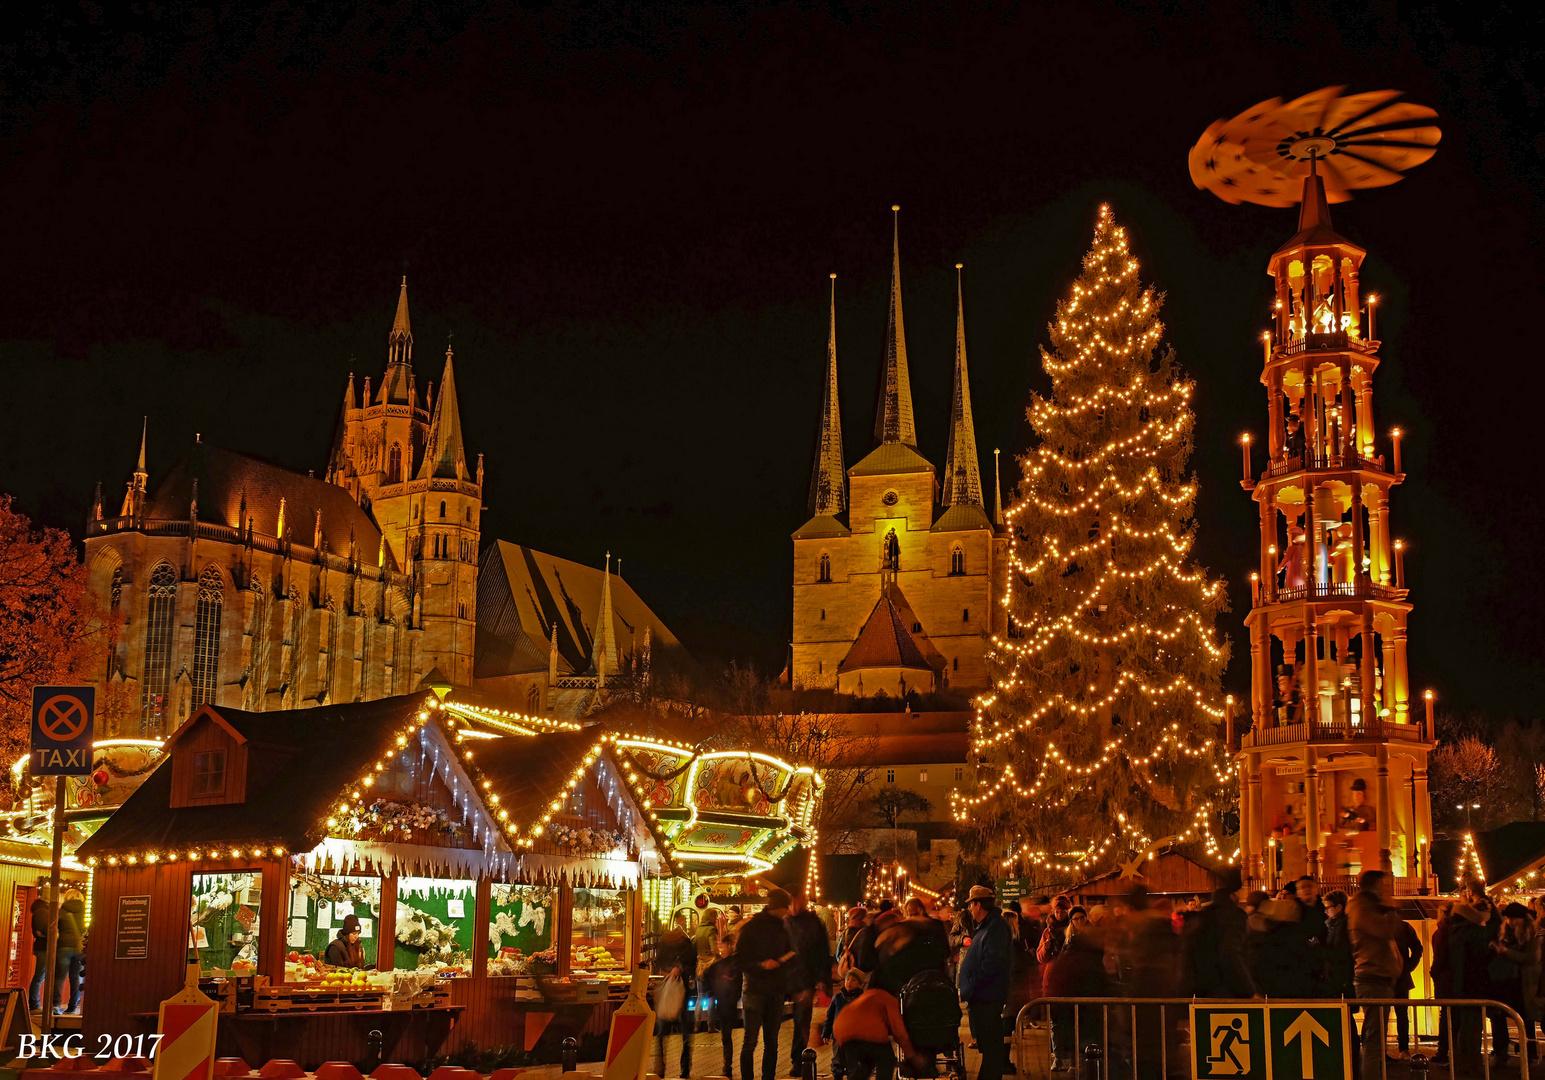 Weihnachtsmarkt Erfurt.Weihnachtsmarkt Erfurt Foto Bild Reportage Dokumentation